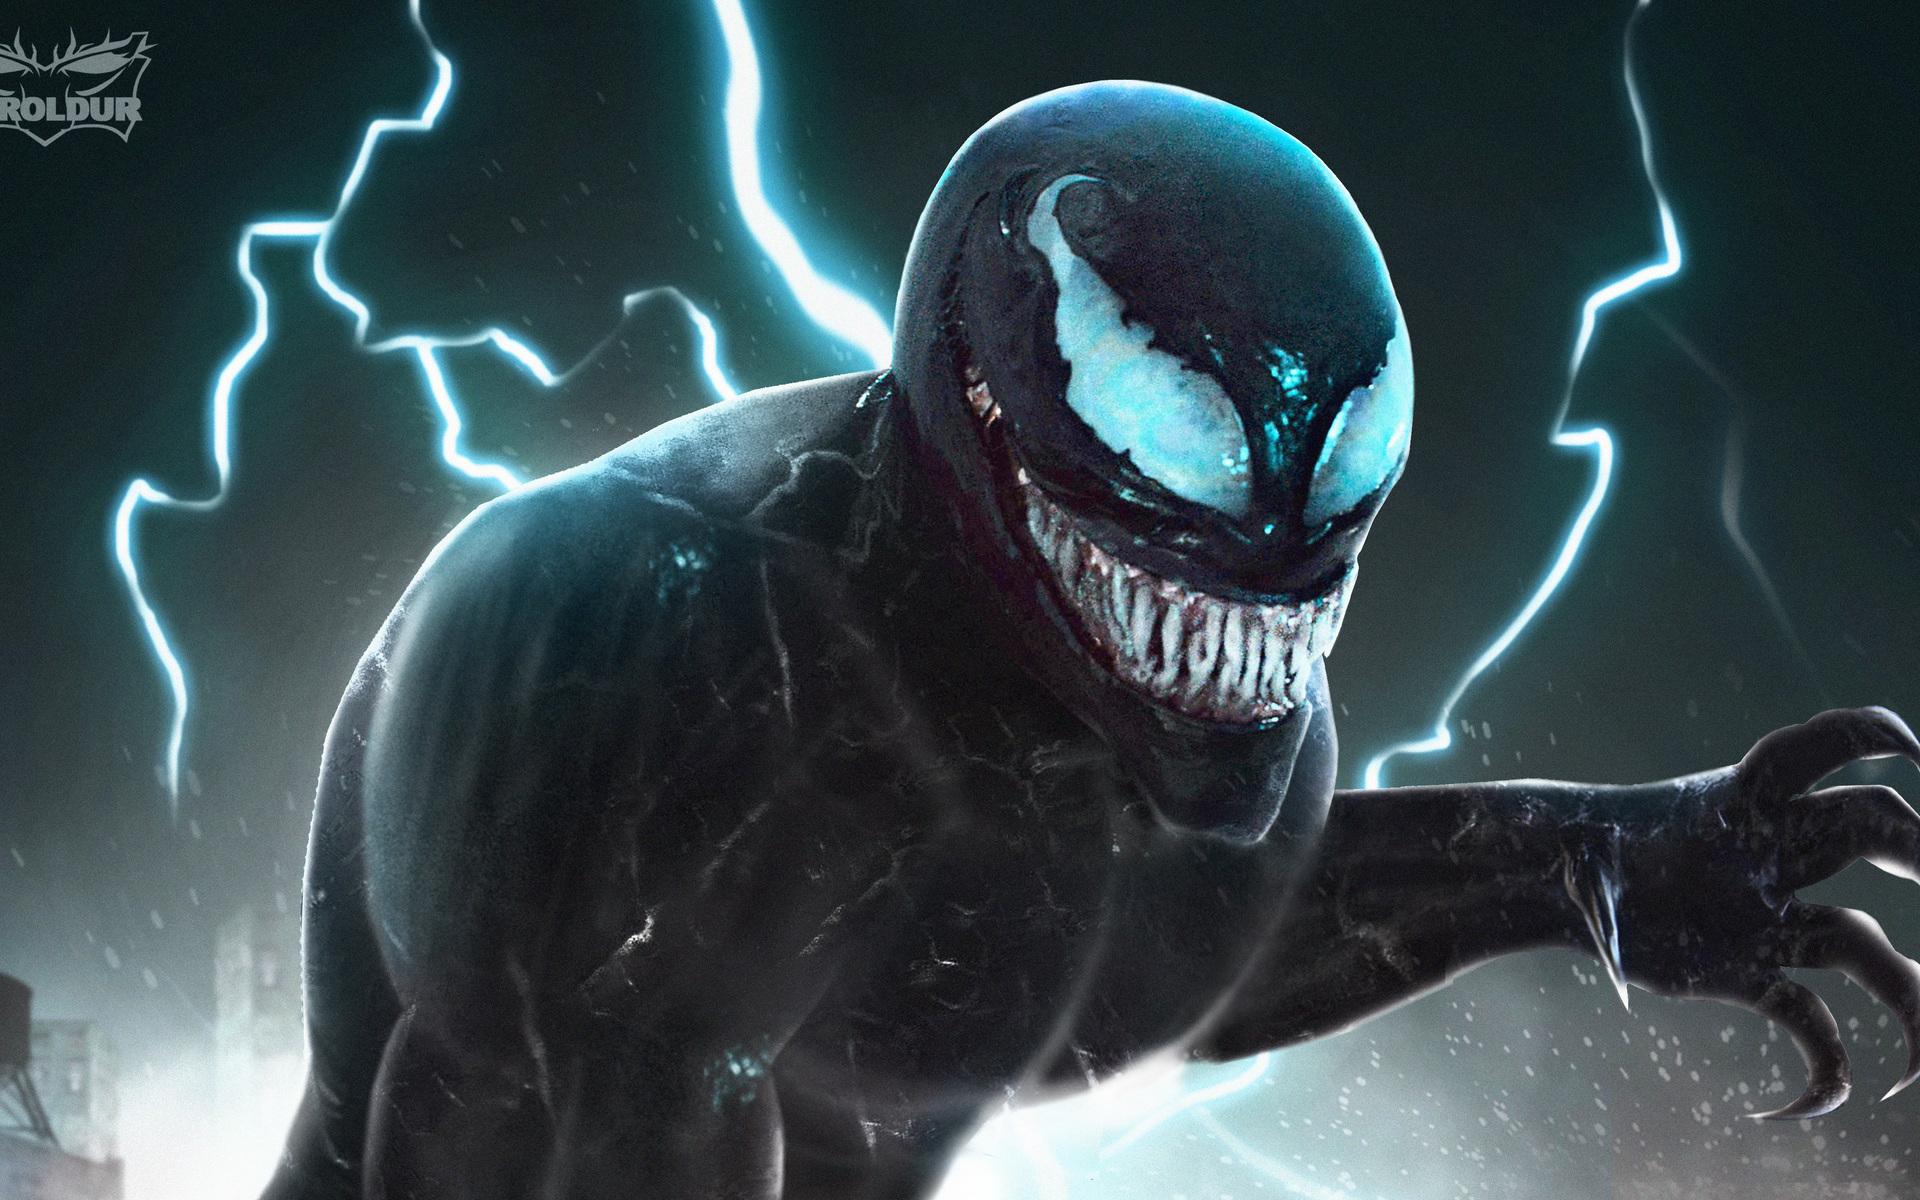 1920x1200 Venom Movie Artwork 4k 1080P Resolution HD 4k ...